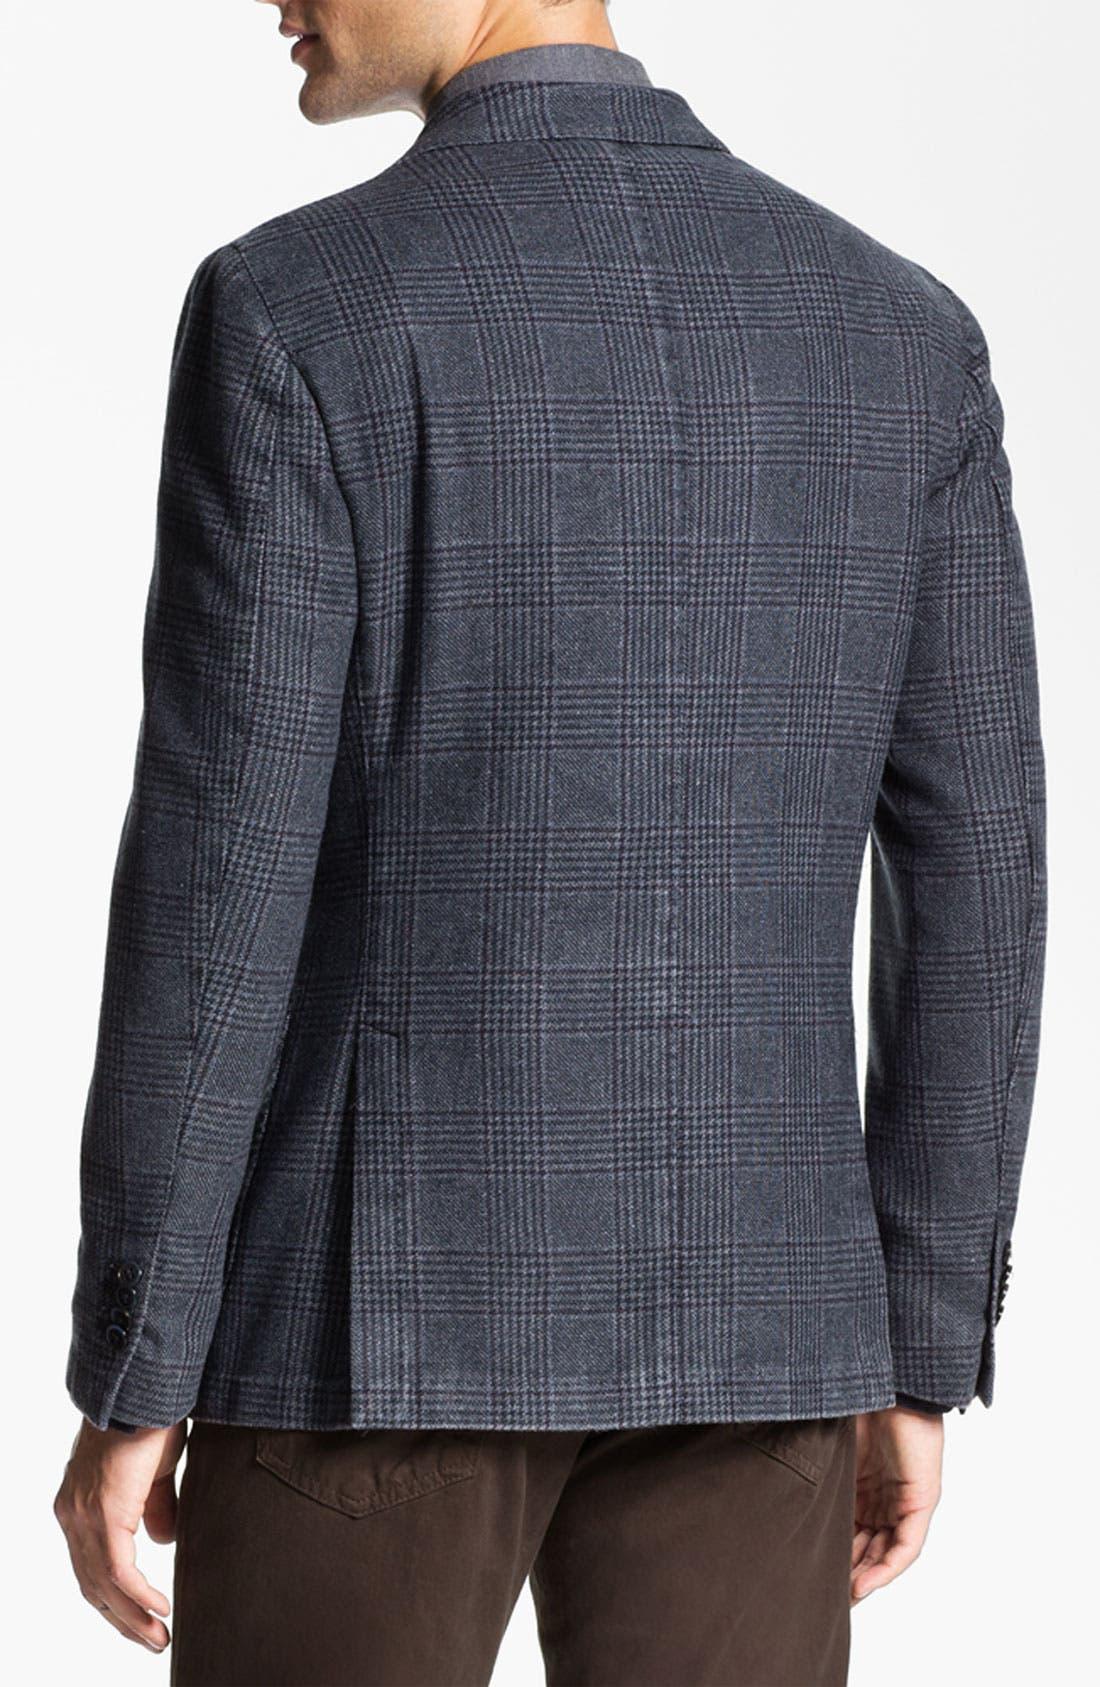 Alternate Image 2  - Lubiam Trim Fit Plaid Wool Blend Sportcoat